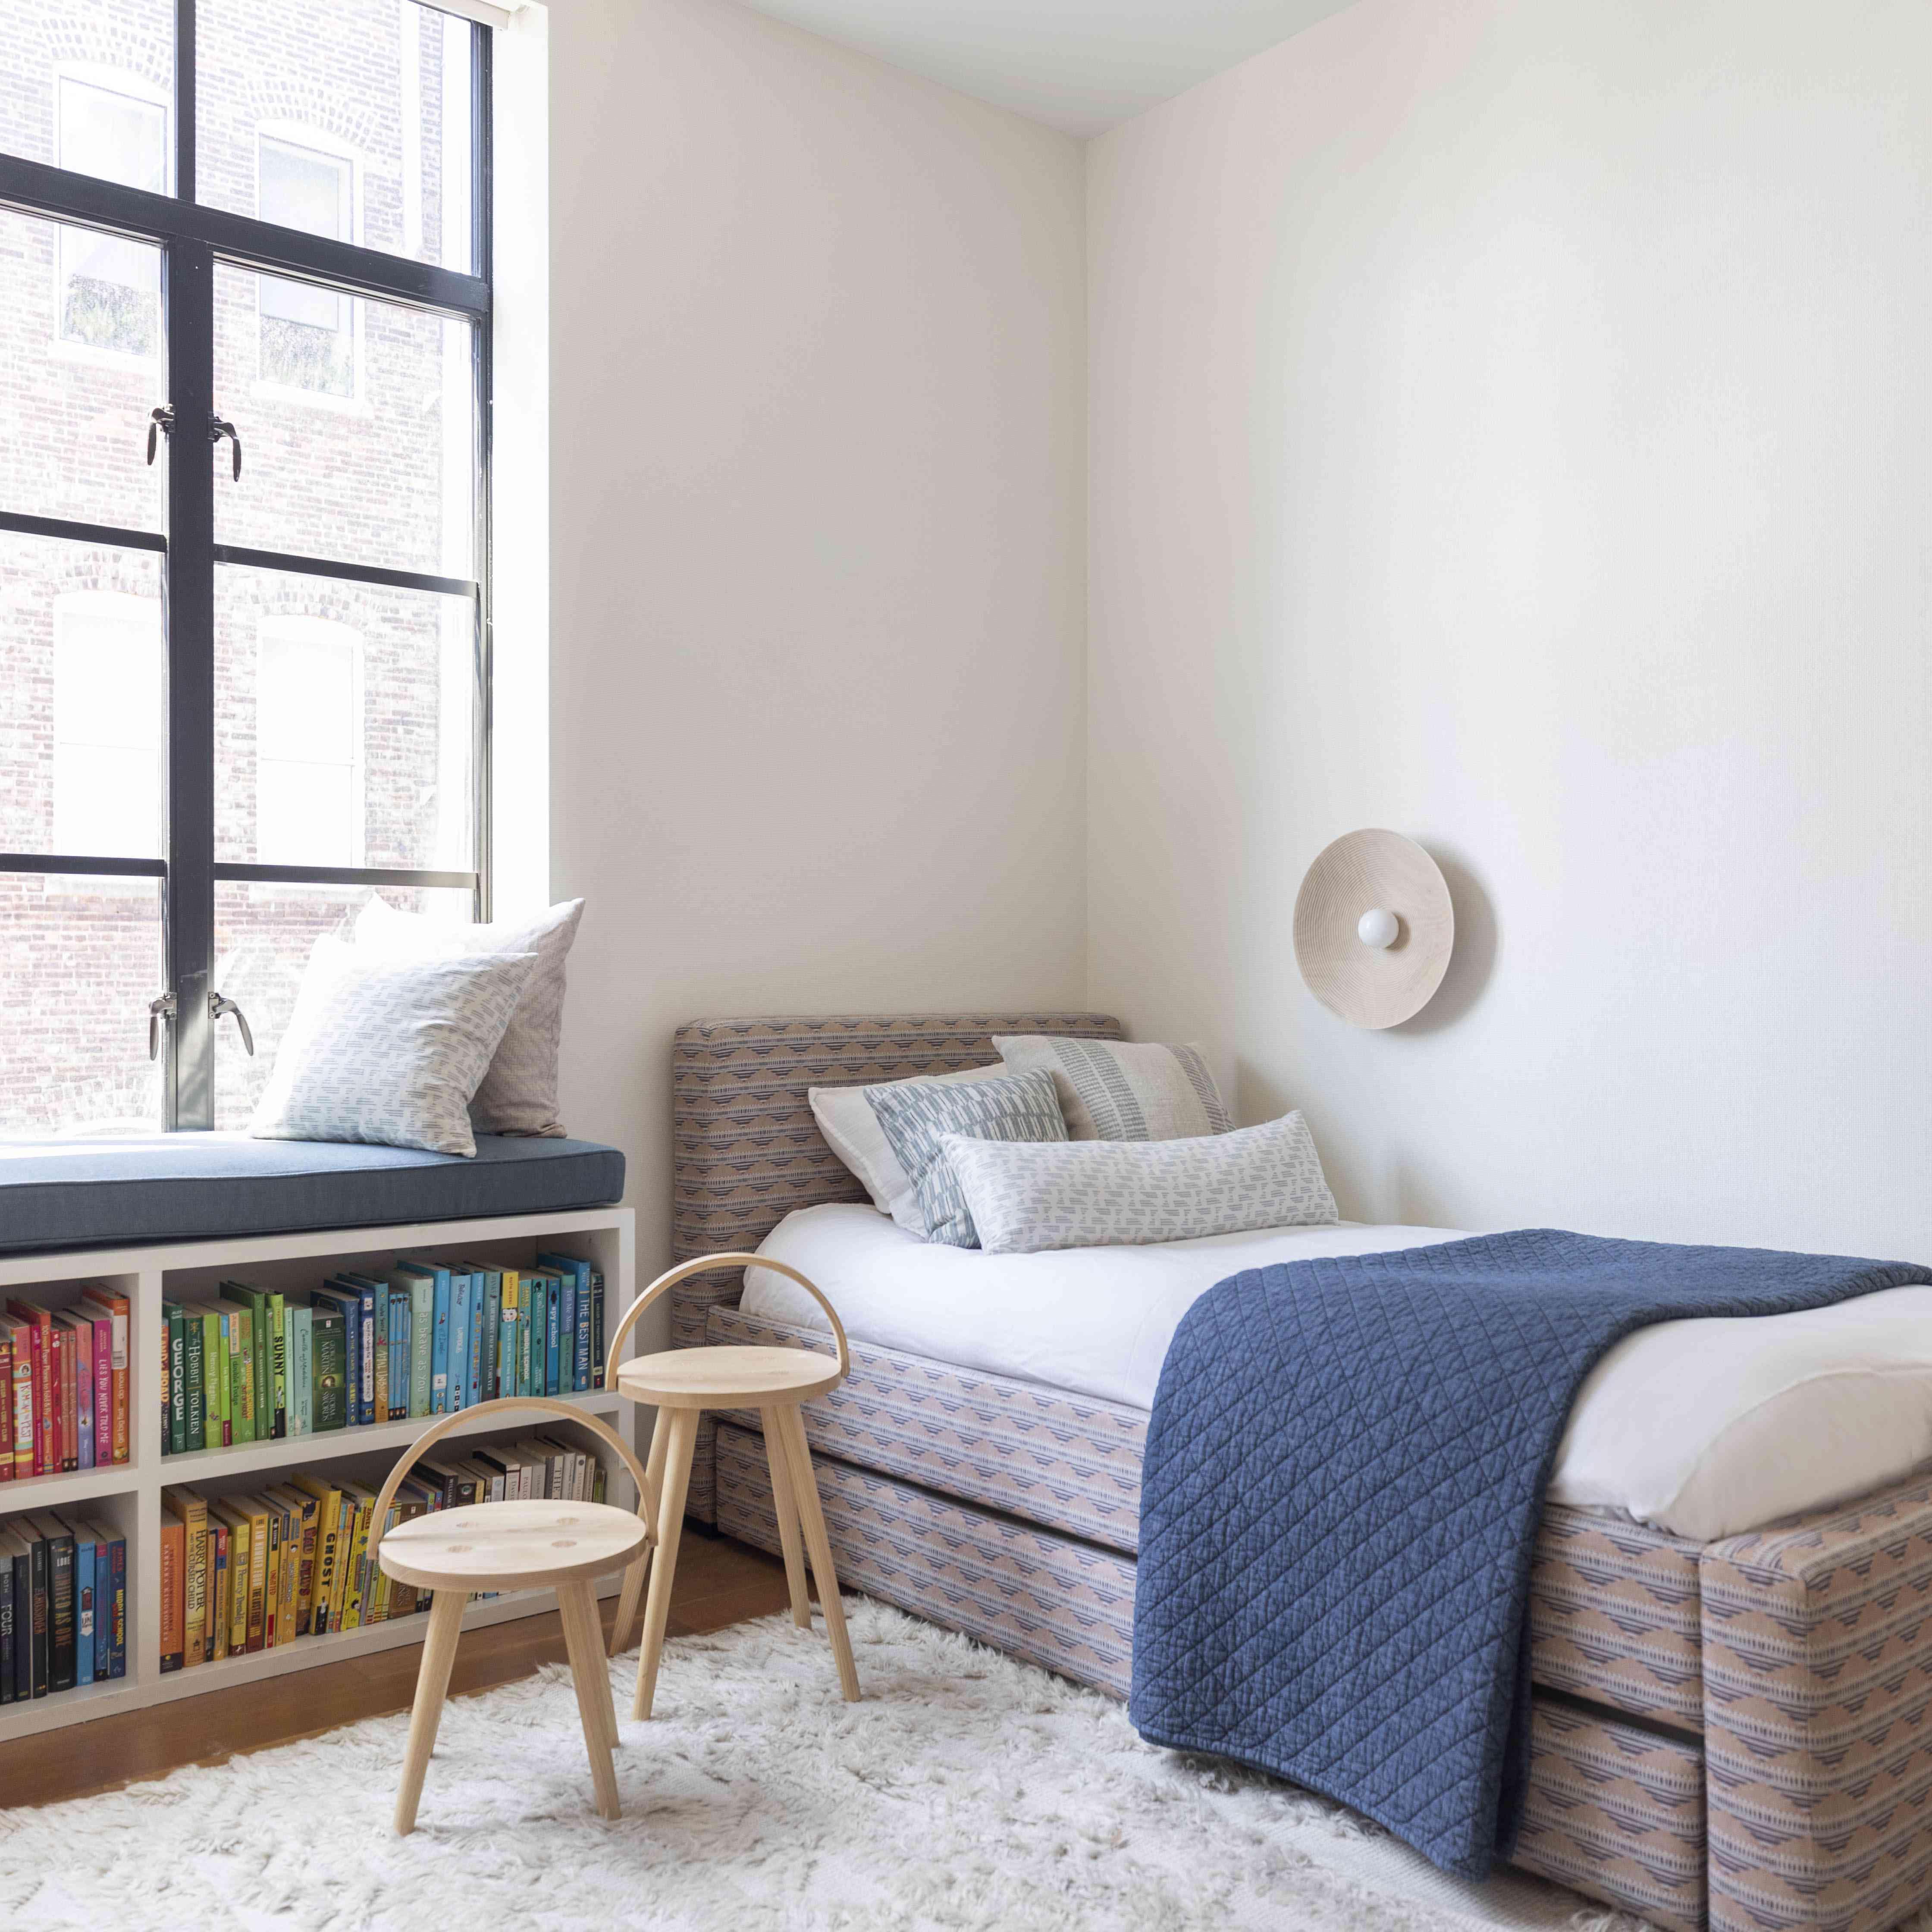 yael weiss nyc apartment tour - children's bedroom